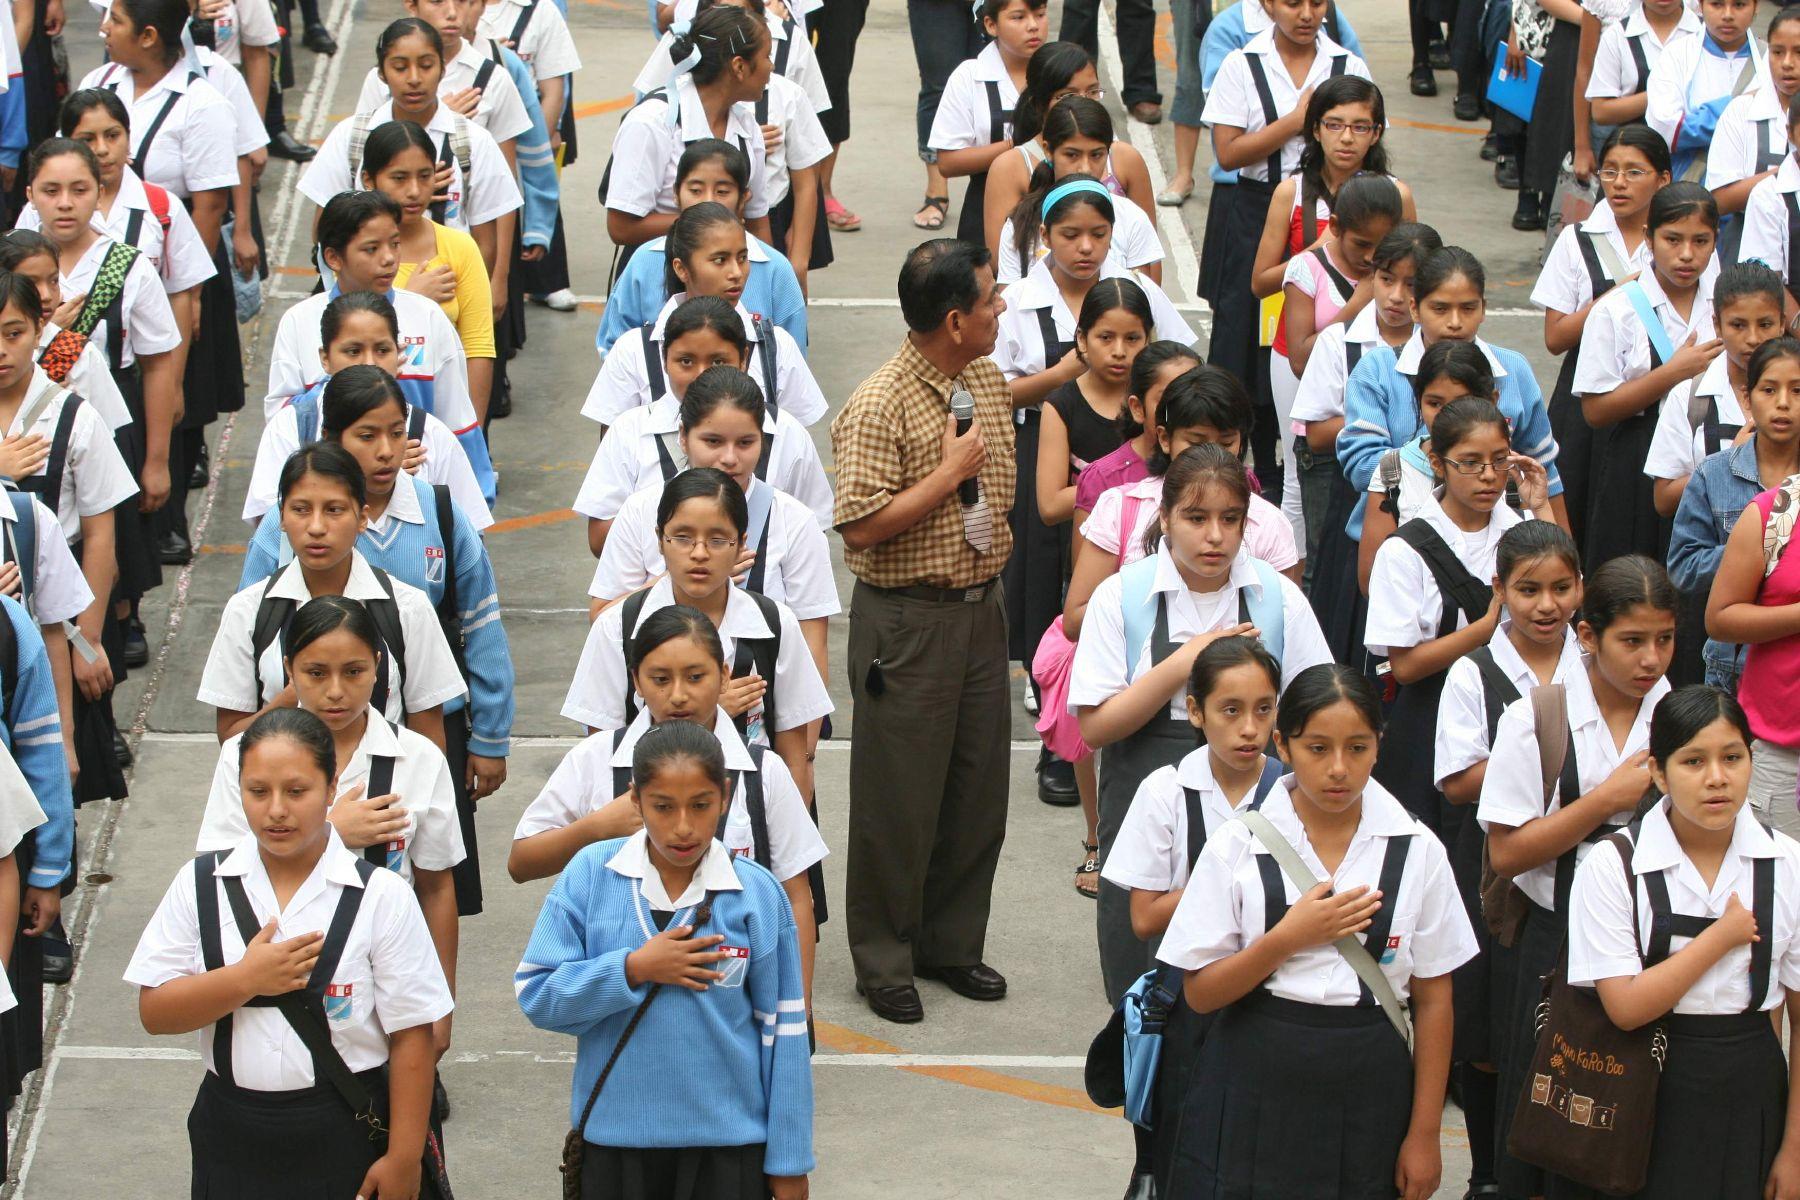 escuela secundaria maduras peruanas